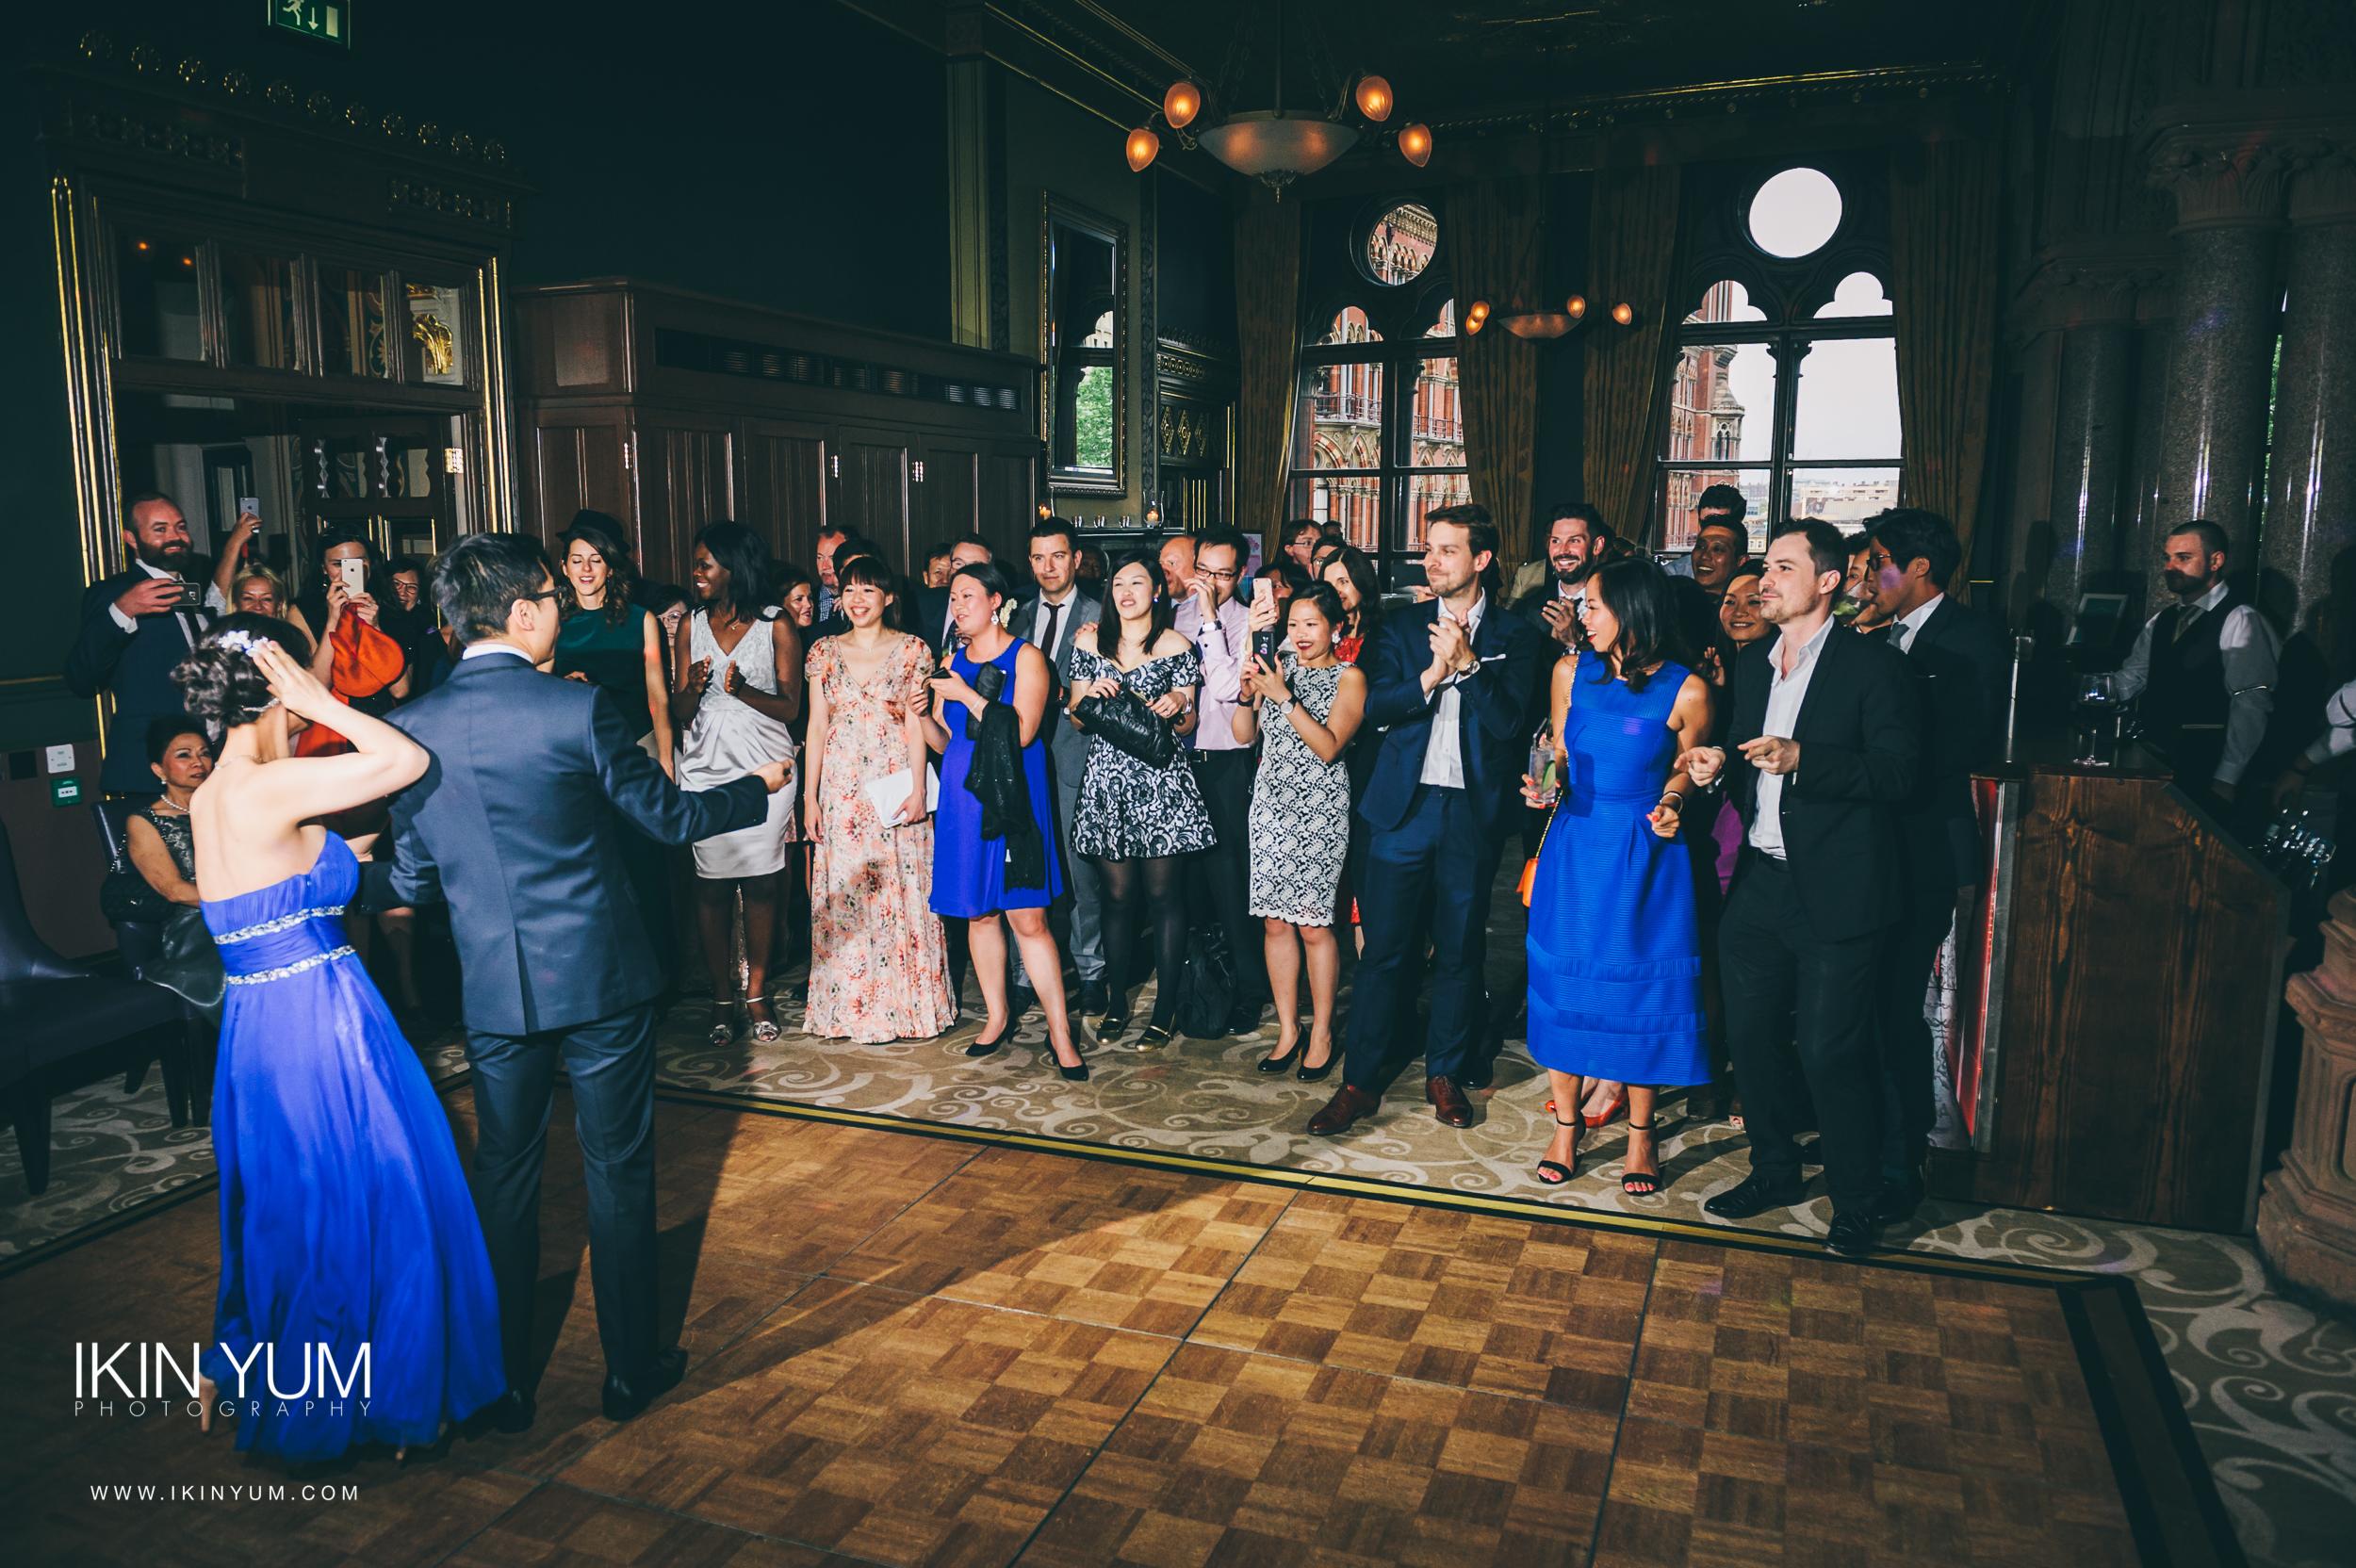 St Pancras Renaissance Hotel - Wedding - Ikin Yum Photography-150.jpg